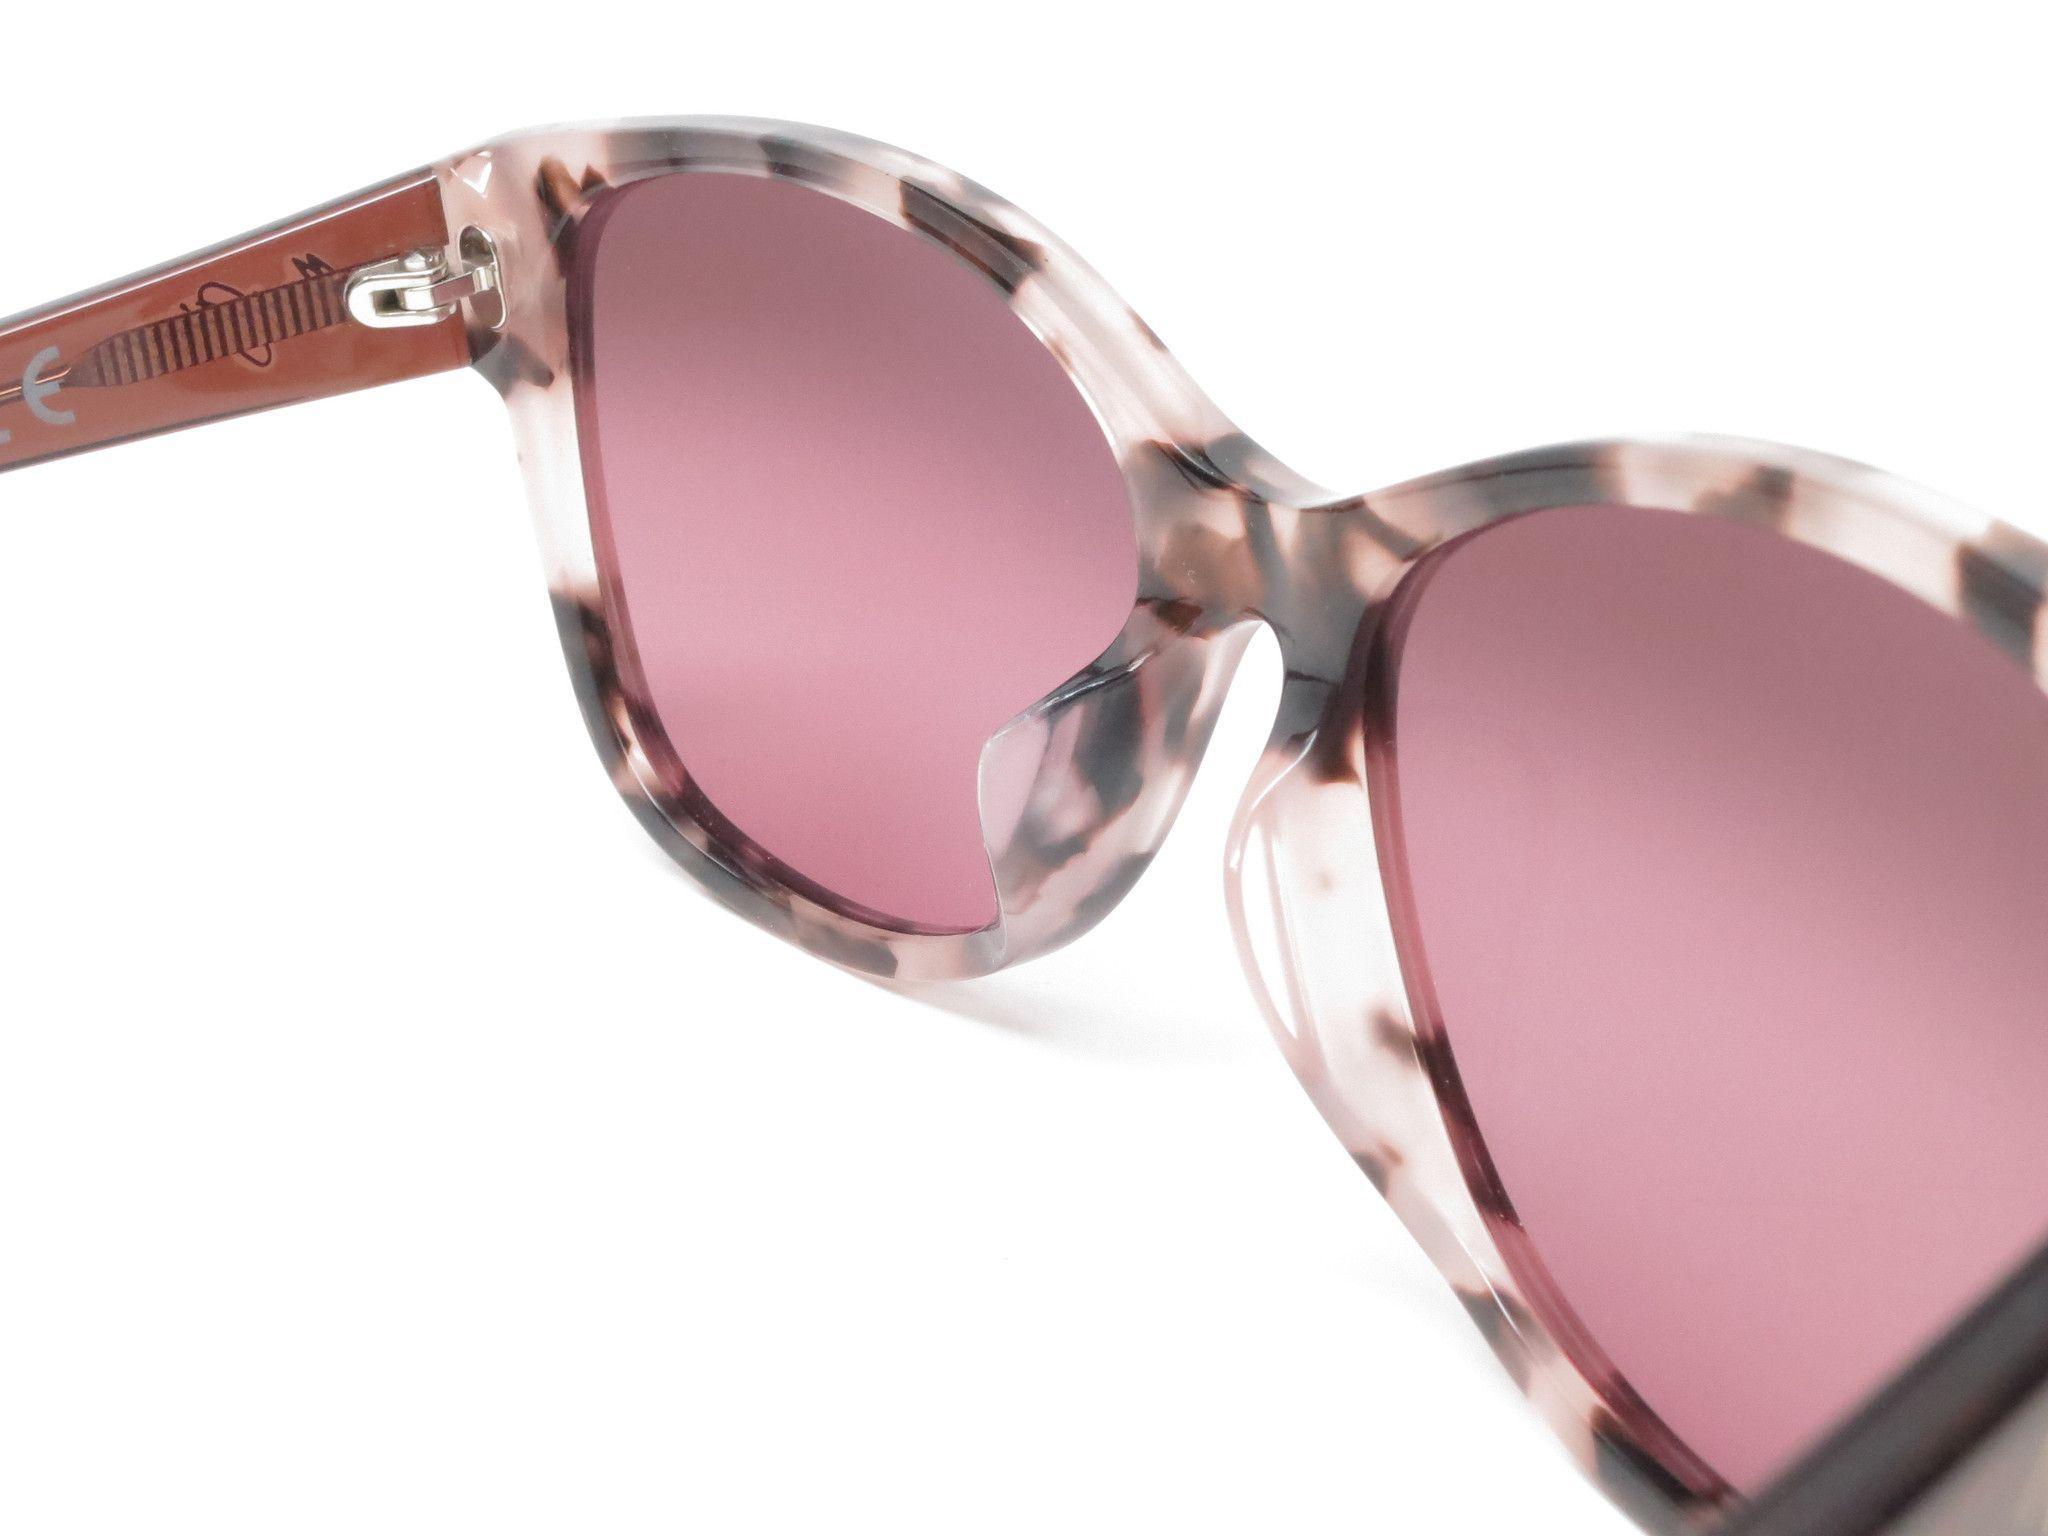 adfe0e087992 Product Details of Maui Jim Summer Time MJ 732-09T Sunglasses Brand : Maui  Jim Model Name : Summer Time Model Number : MJ 732-09T Gender : Womens  Frame ...